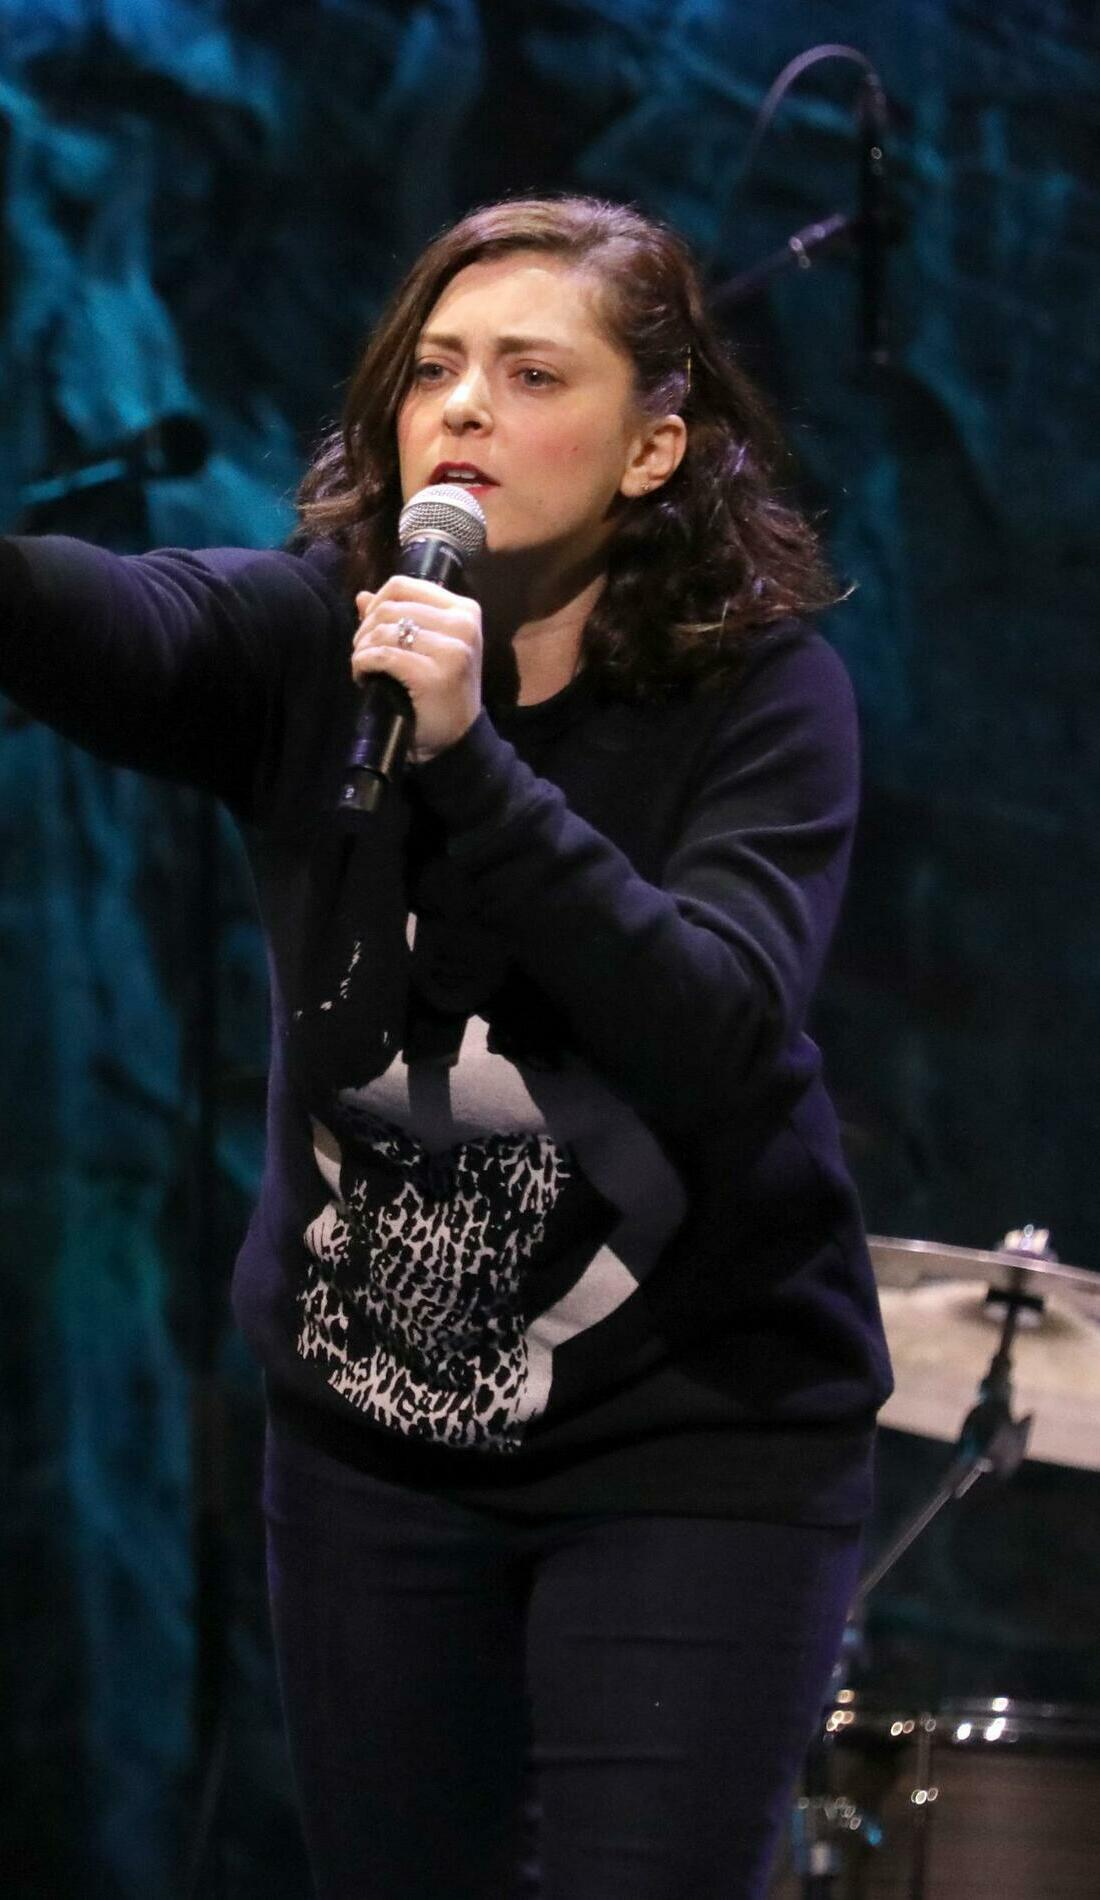 A Rachel Bloom live event